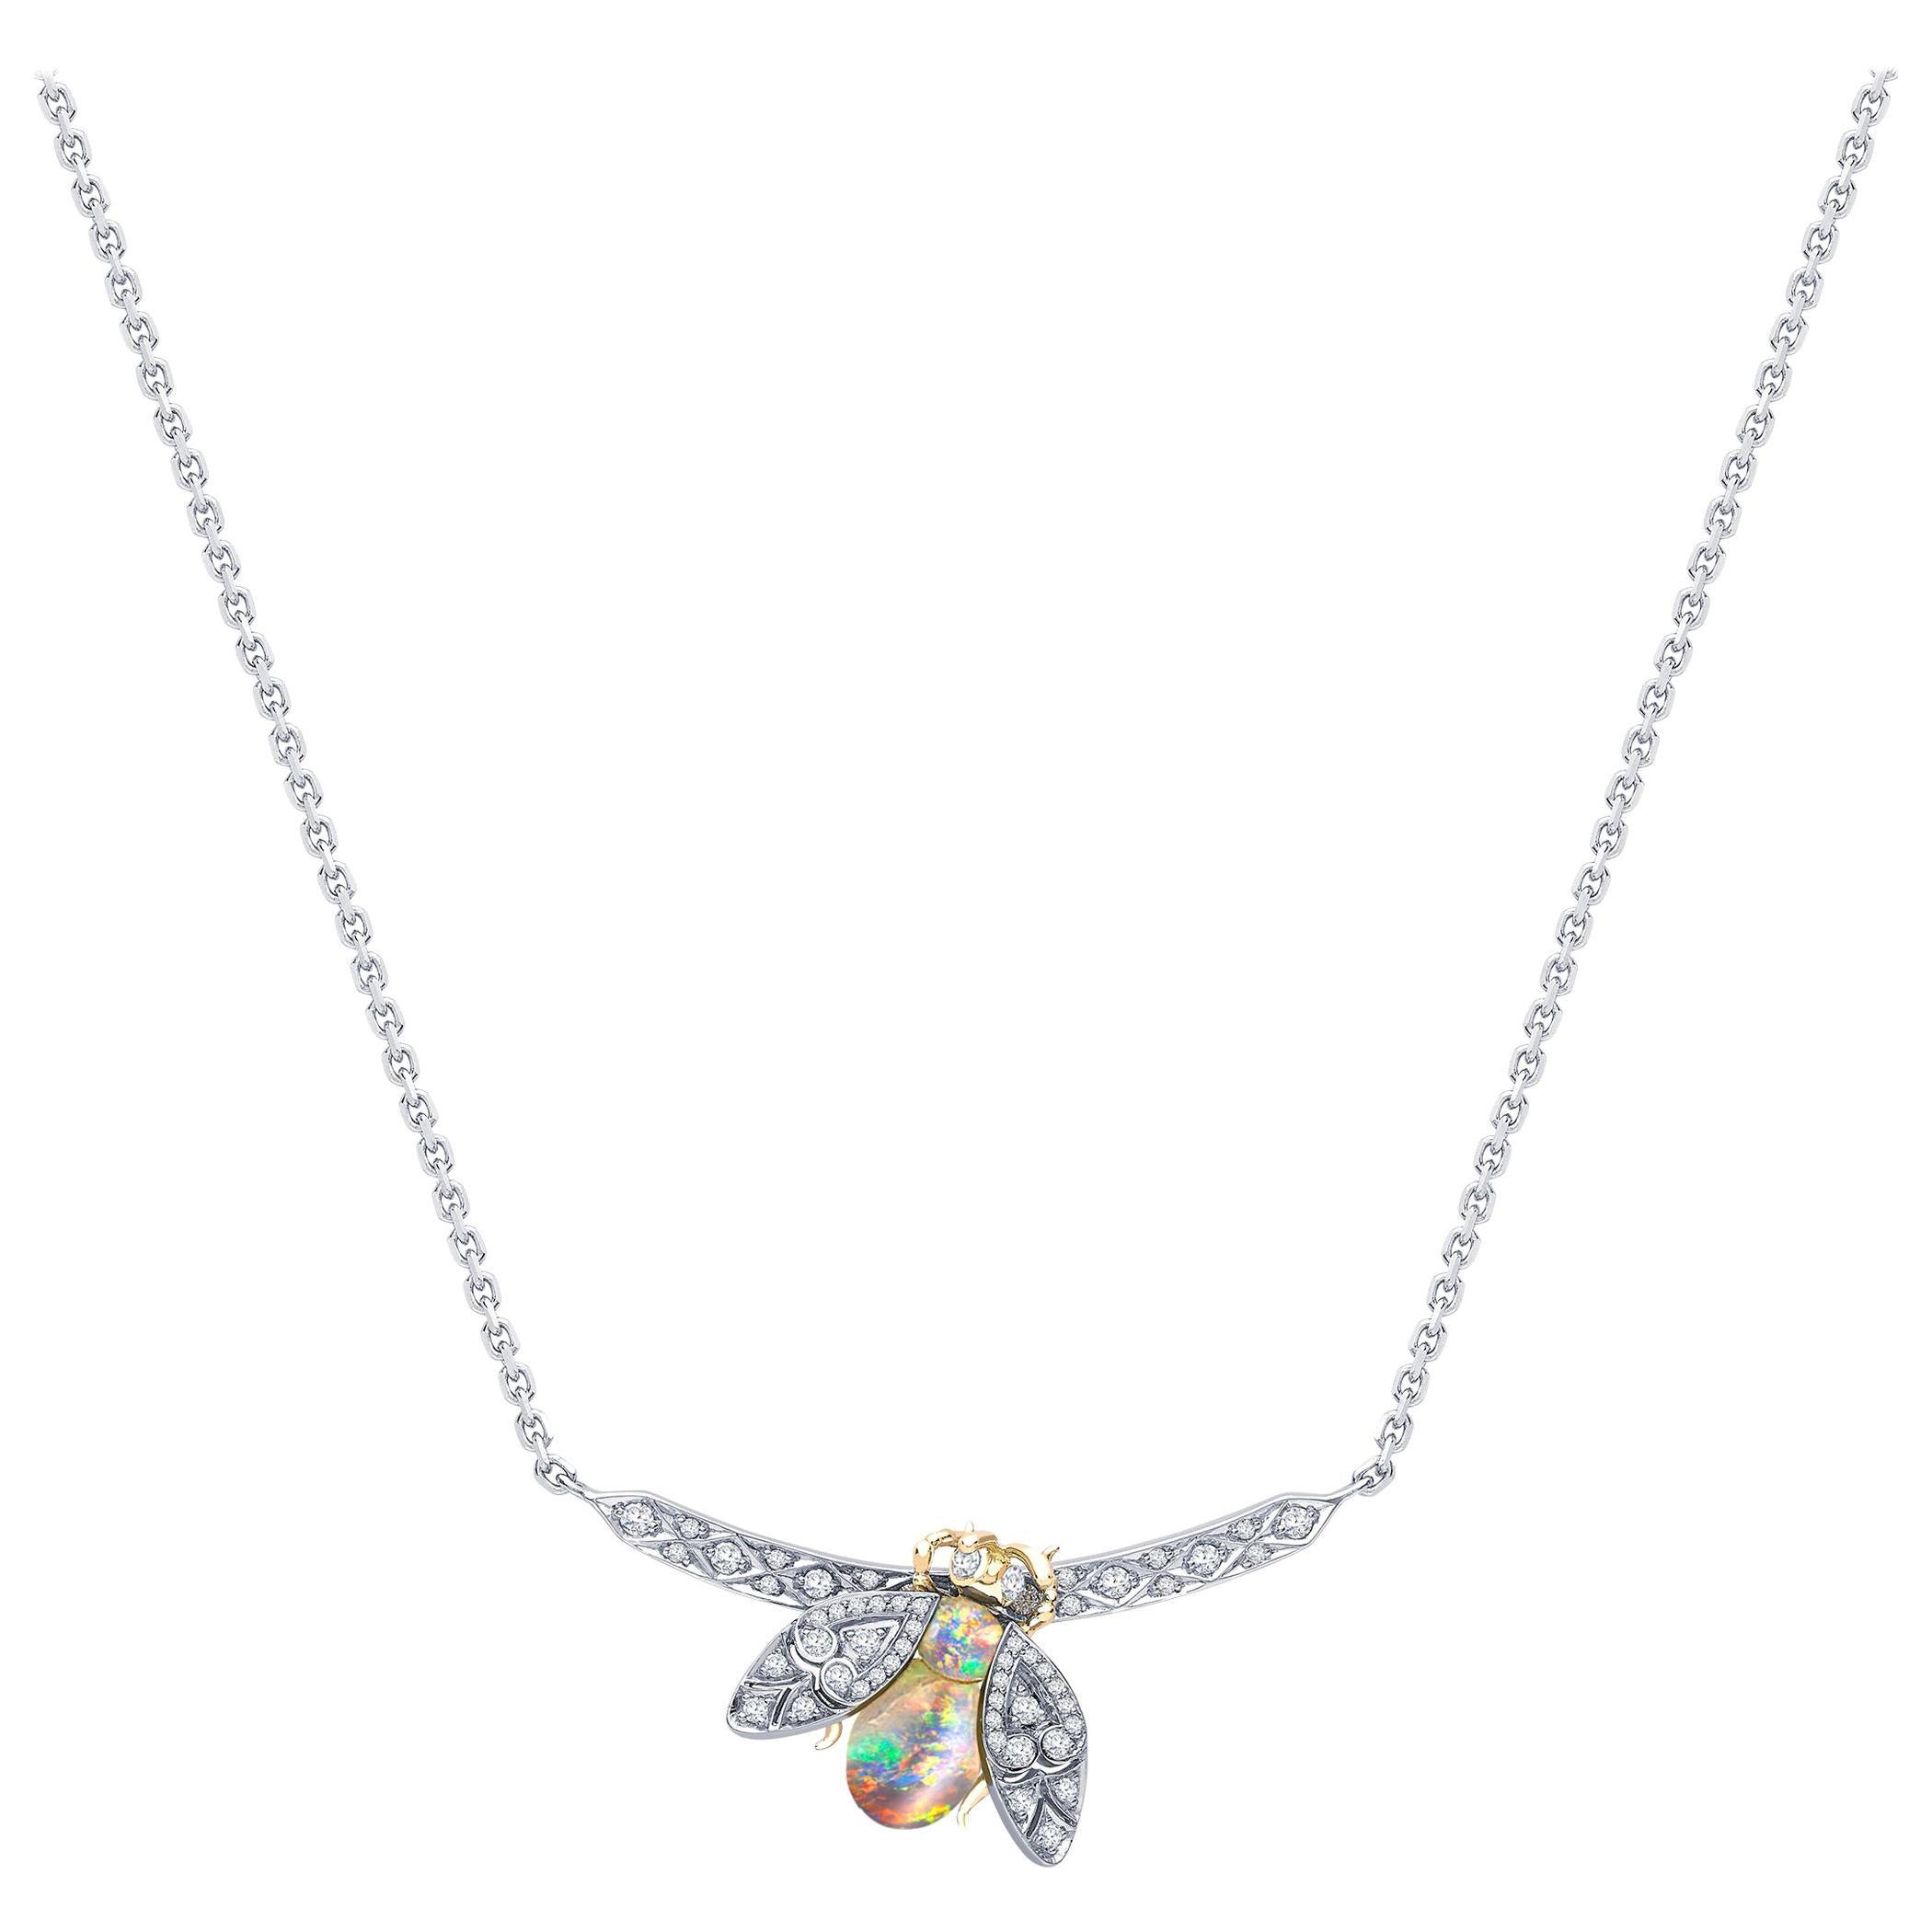 Garrard 'Enchanted Palace' 18 Karat White Gold White Diamond Opal Bug Pendant